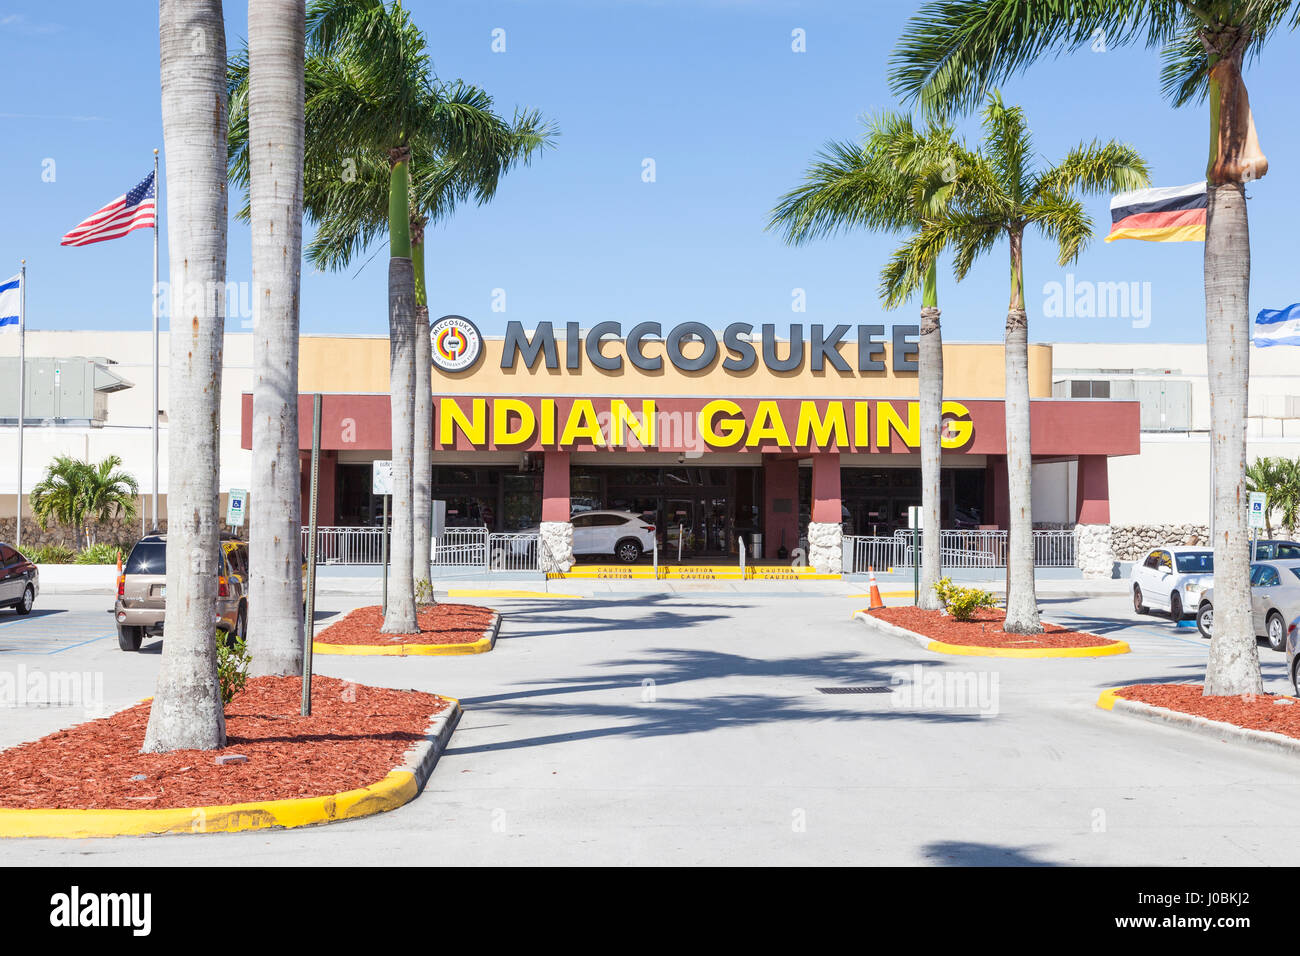 Casino miami indian casino express wendover nevada